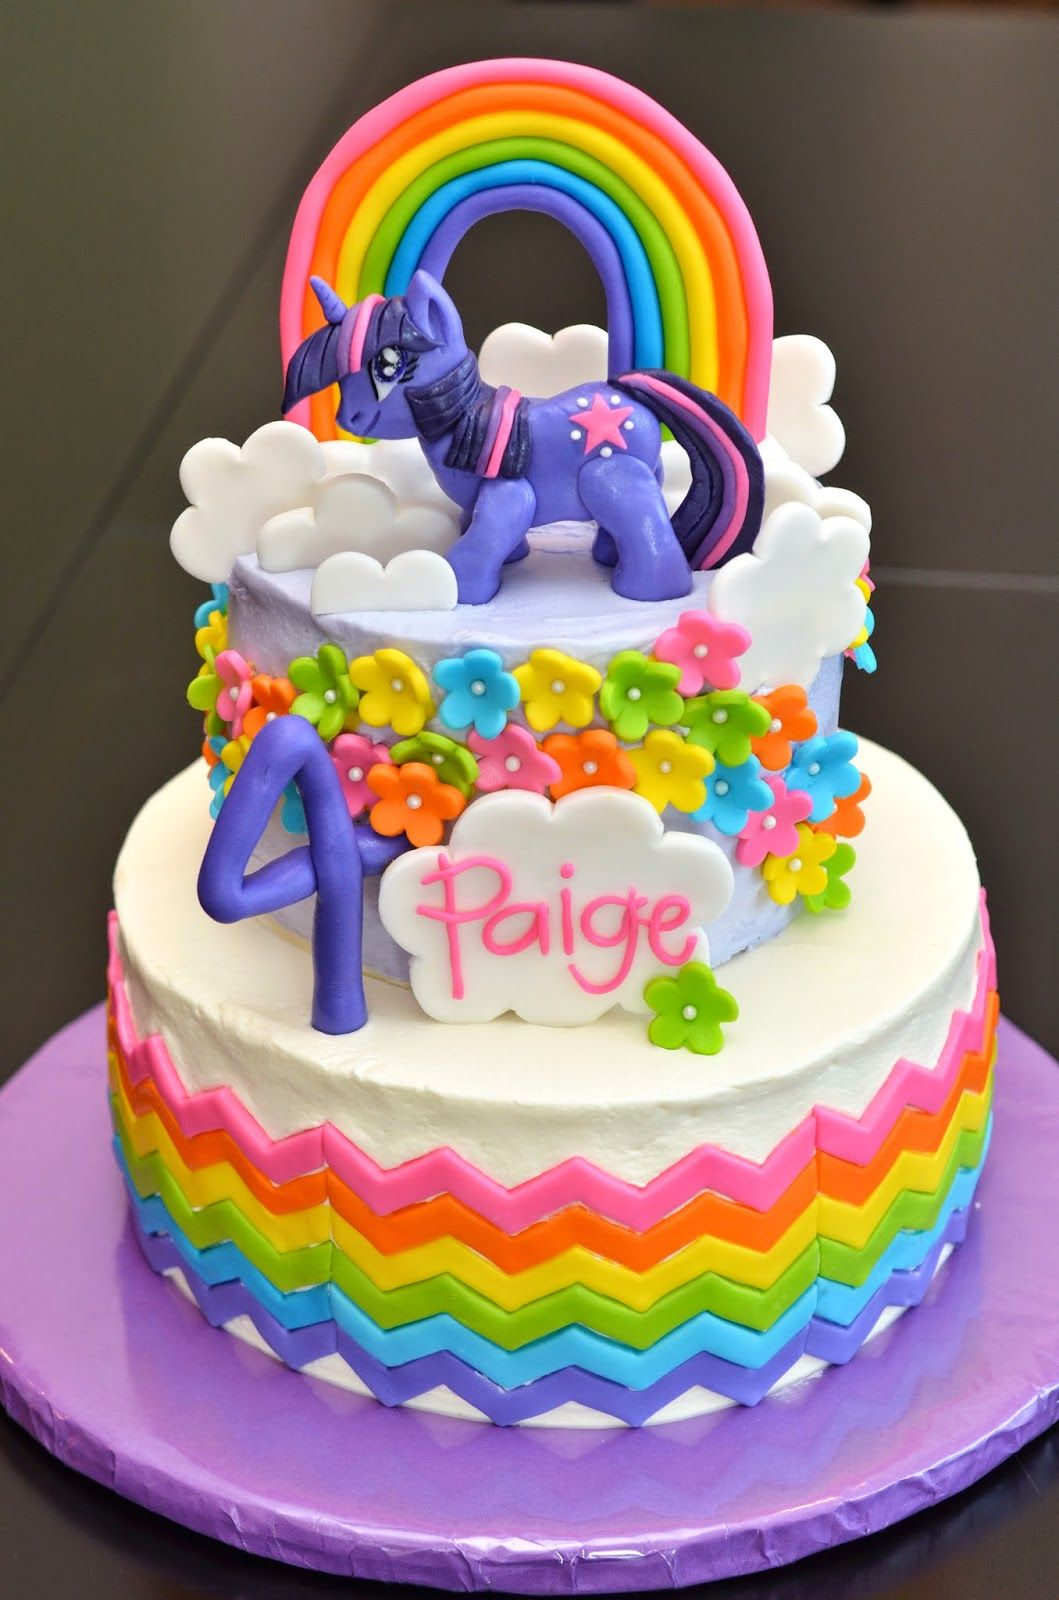 Twilight Sparkle Birthday Cakes